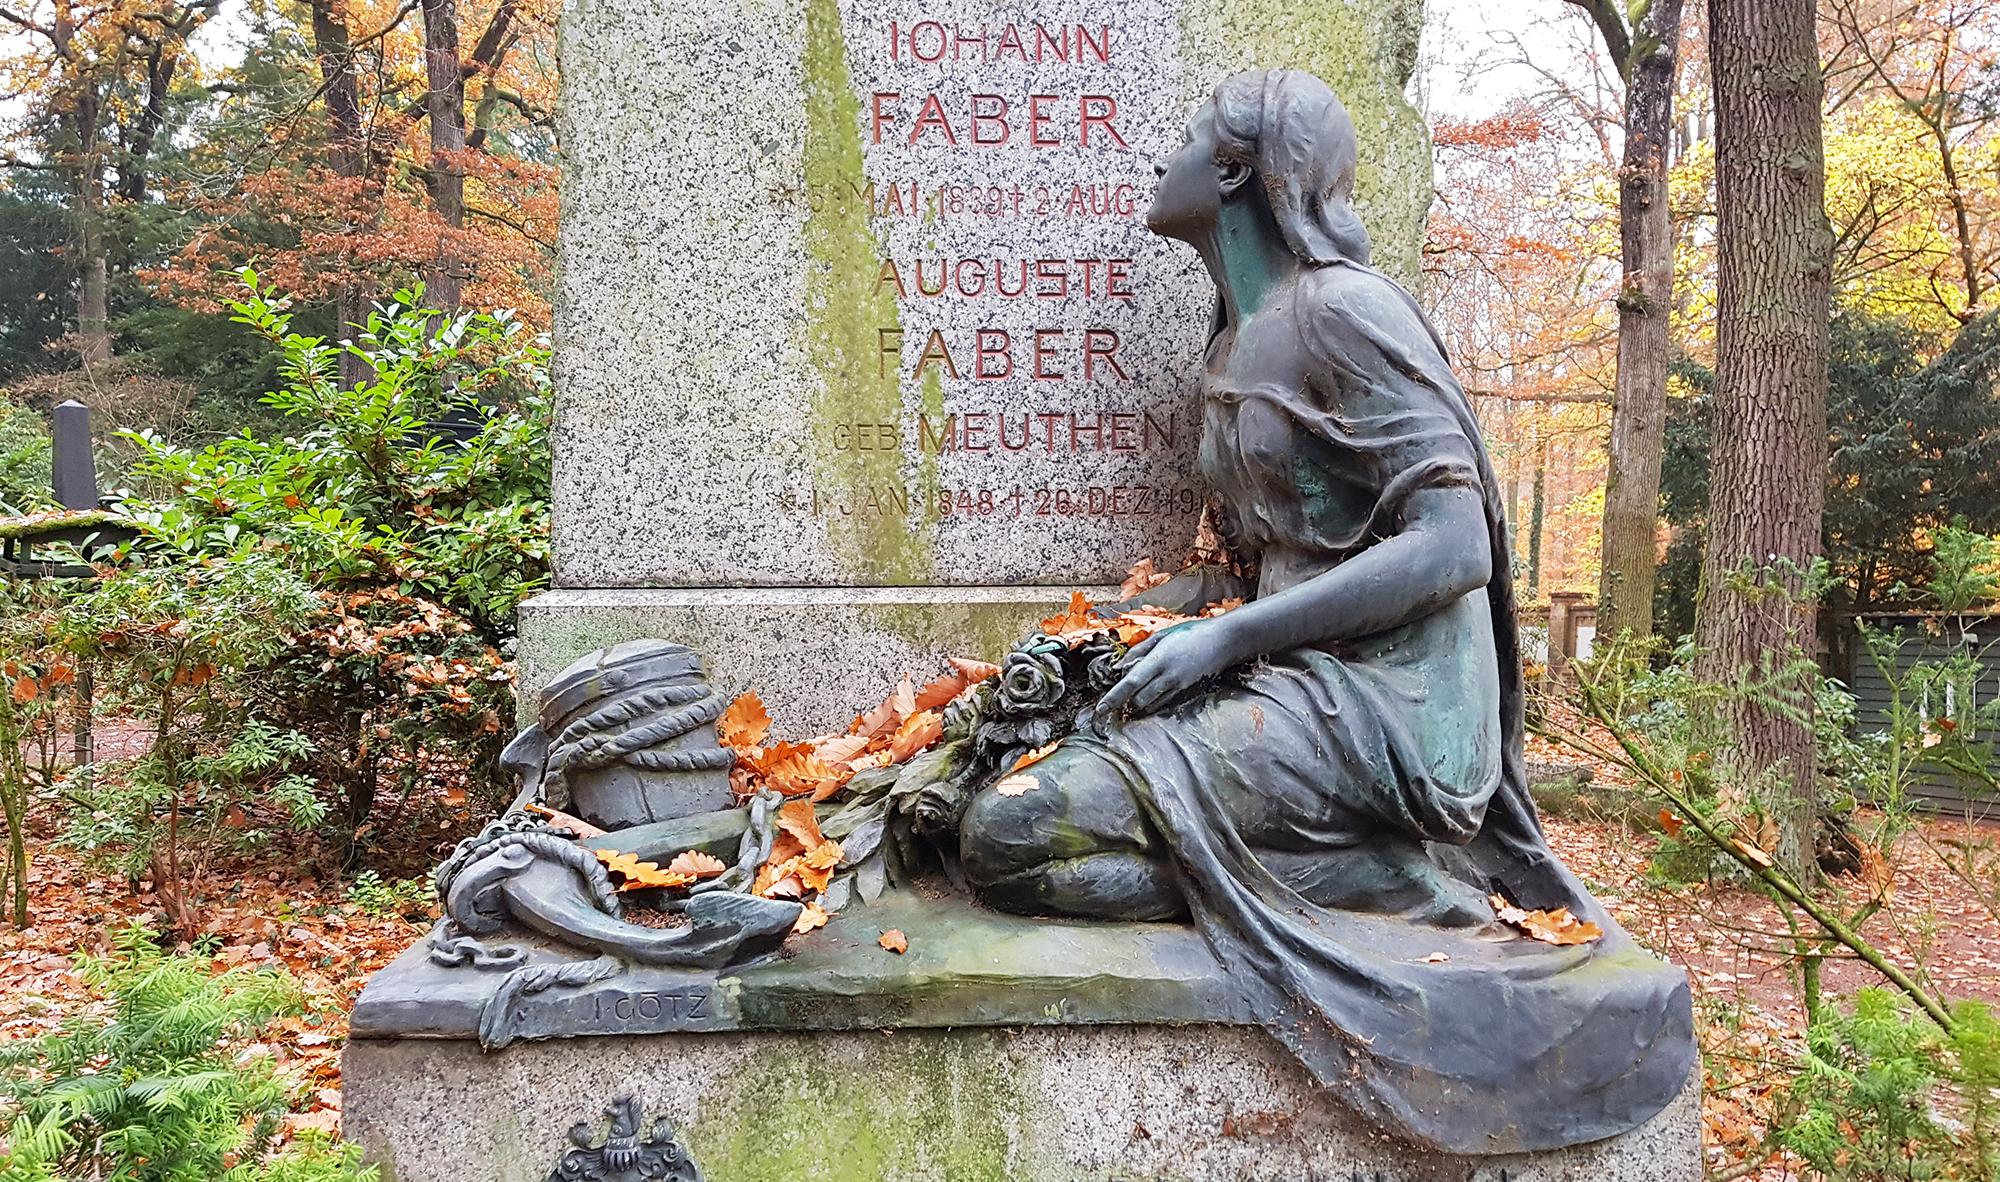 antiker grabstein aus granit bronzefigur jungfrau nordfriedhof wiesbaden. Black Bedroom Furniture Sets. Home Design Ideas